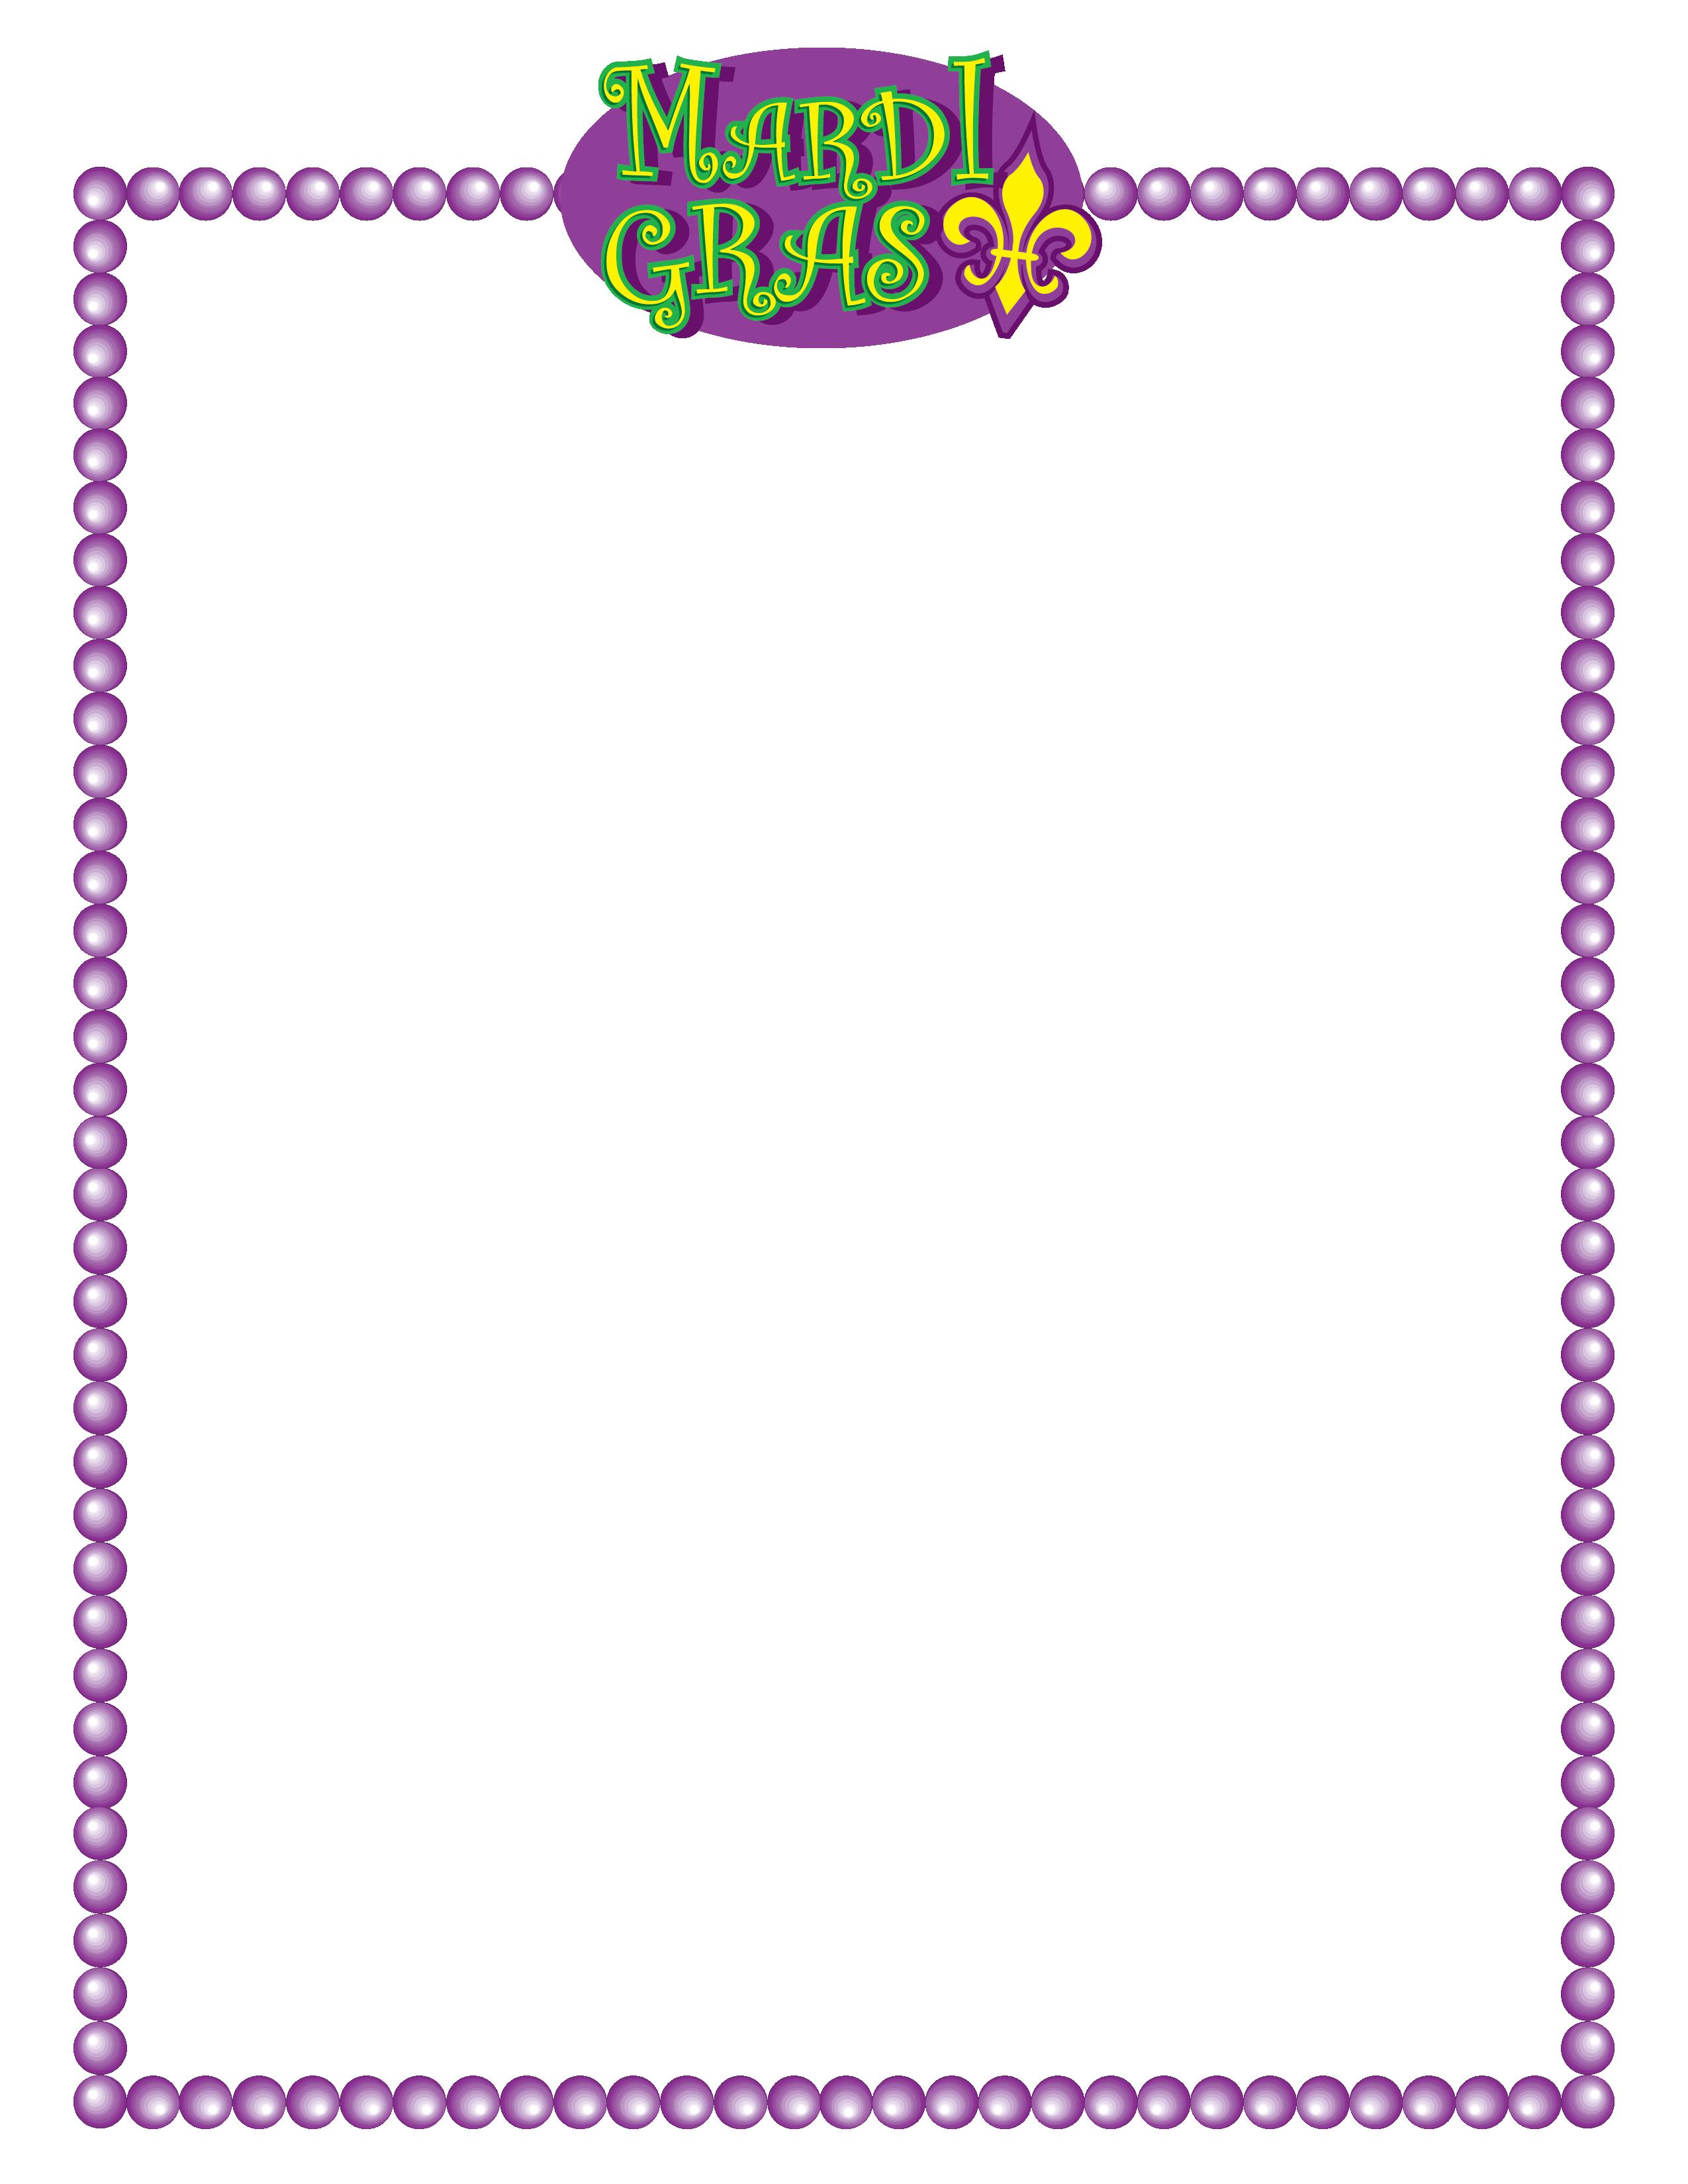 Mardi gras border clipart graphic freeuse download Mardi Gras Stationery Clip Art - New Orleans Free Vector ... graphic freeuse download